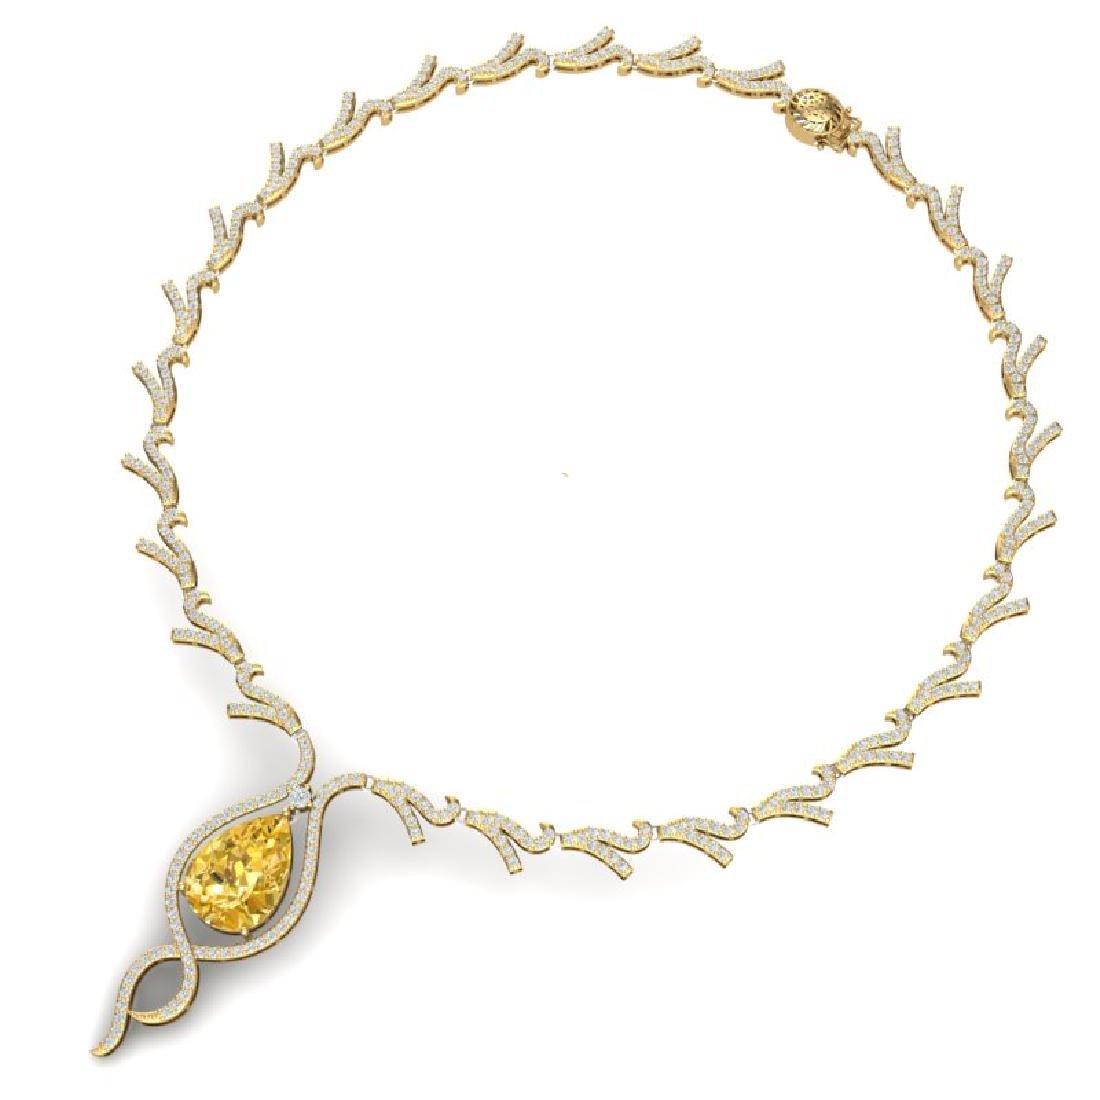 23.02 CTW Royalty Canary Citrine & VS Diamond Necklace - 3